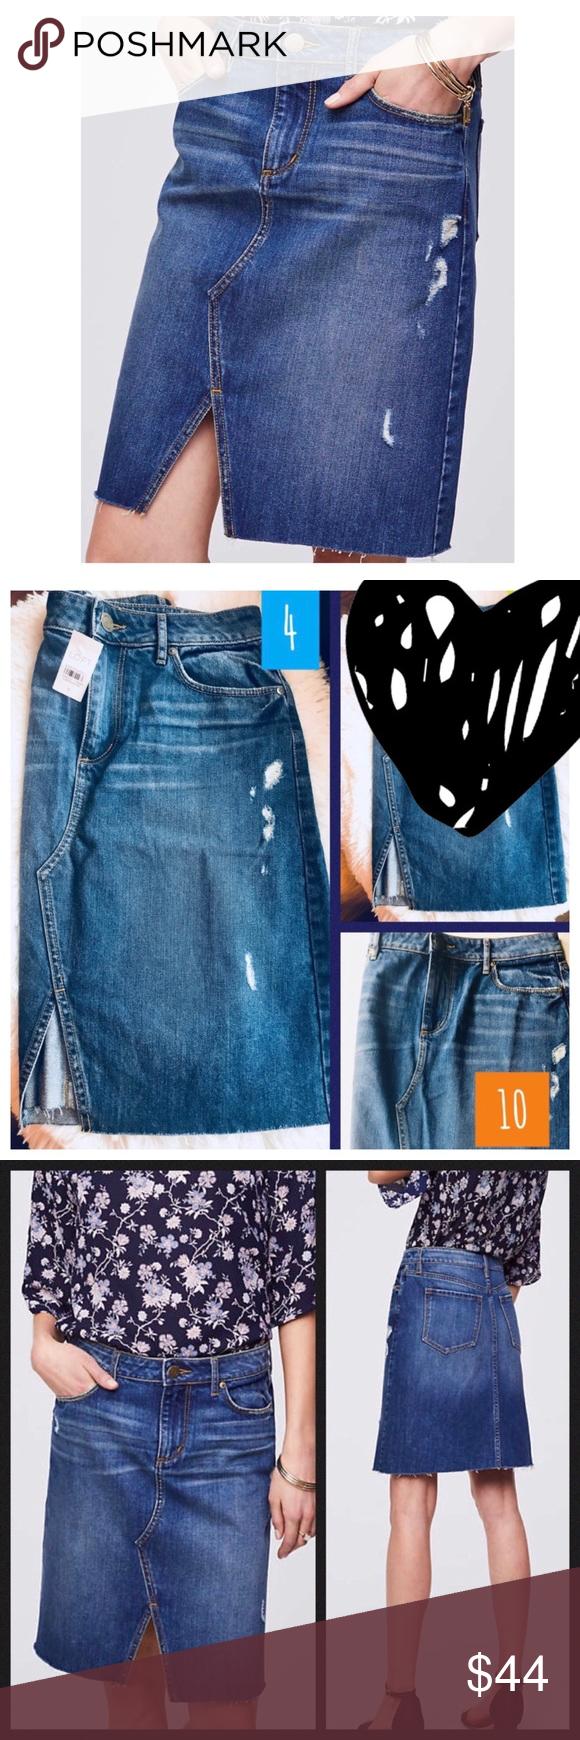 9942a54b04 LOFT Slit Denim Skirt * LOFT * 10 * Blue * Midi length distressed denim  skirt